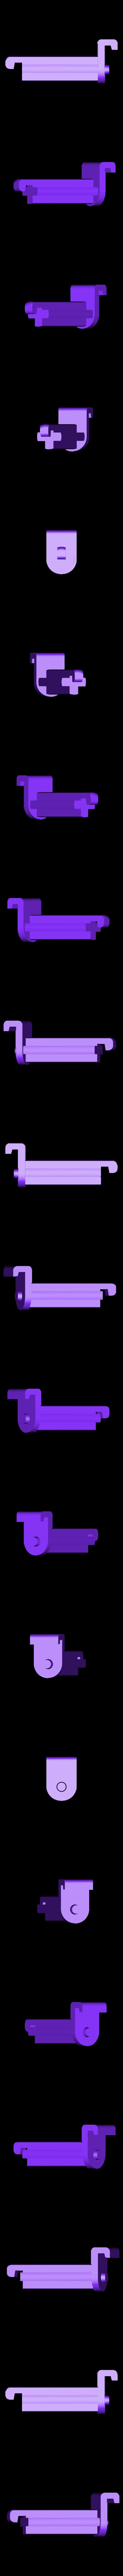 hub.STL Download free STL file Creatr Side-car Spool Holder with Filament Guide • 3D print template, Festus440